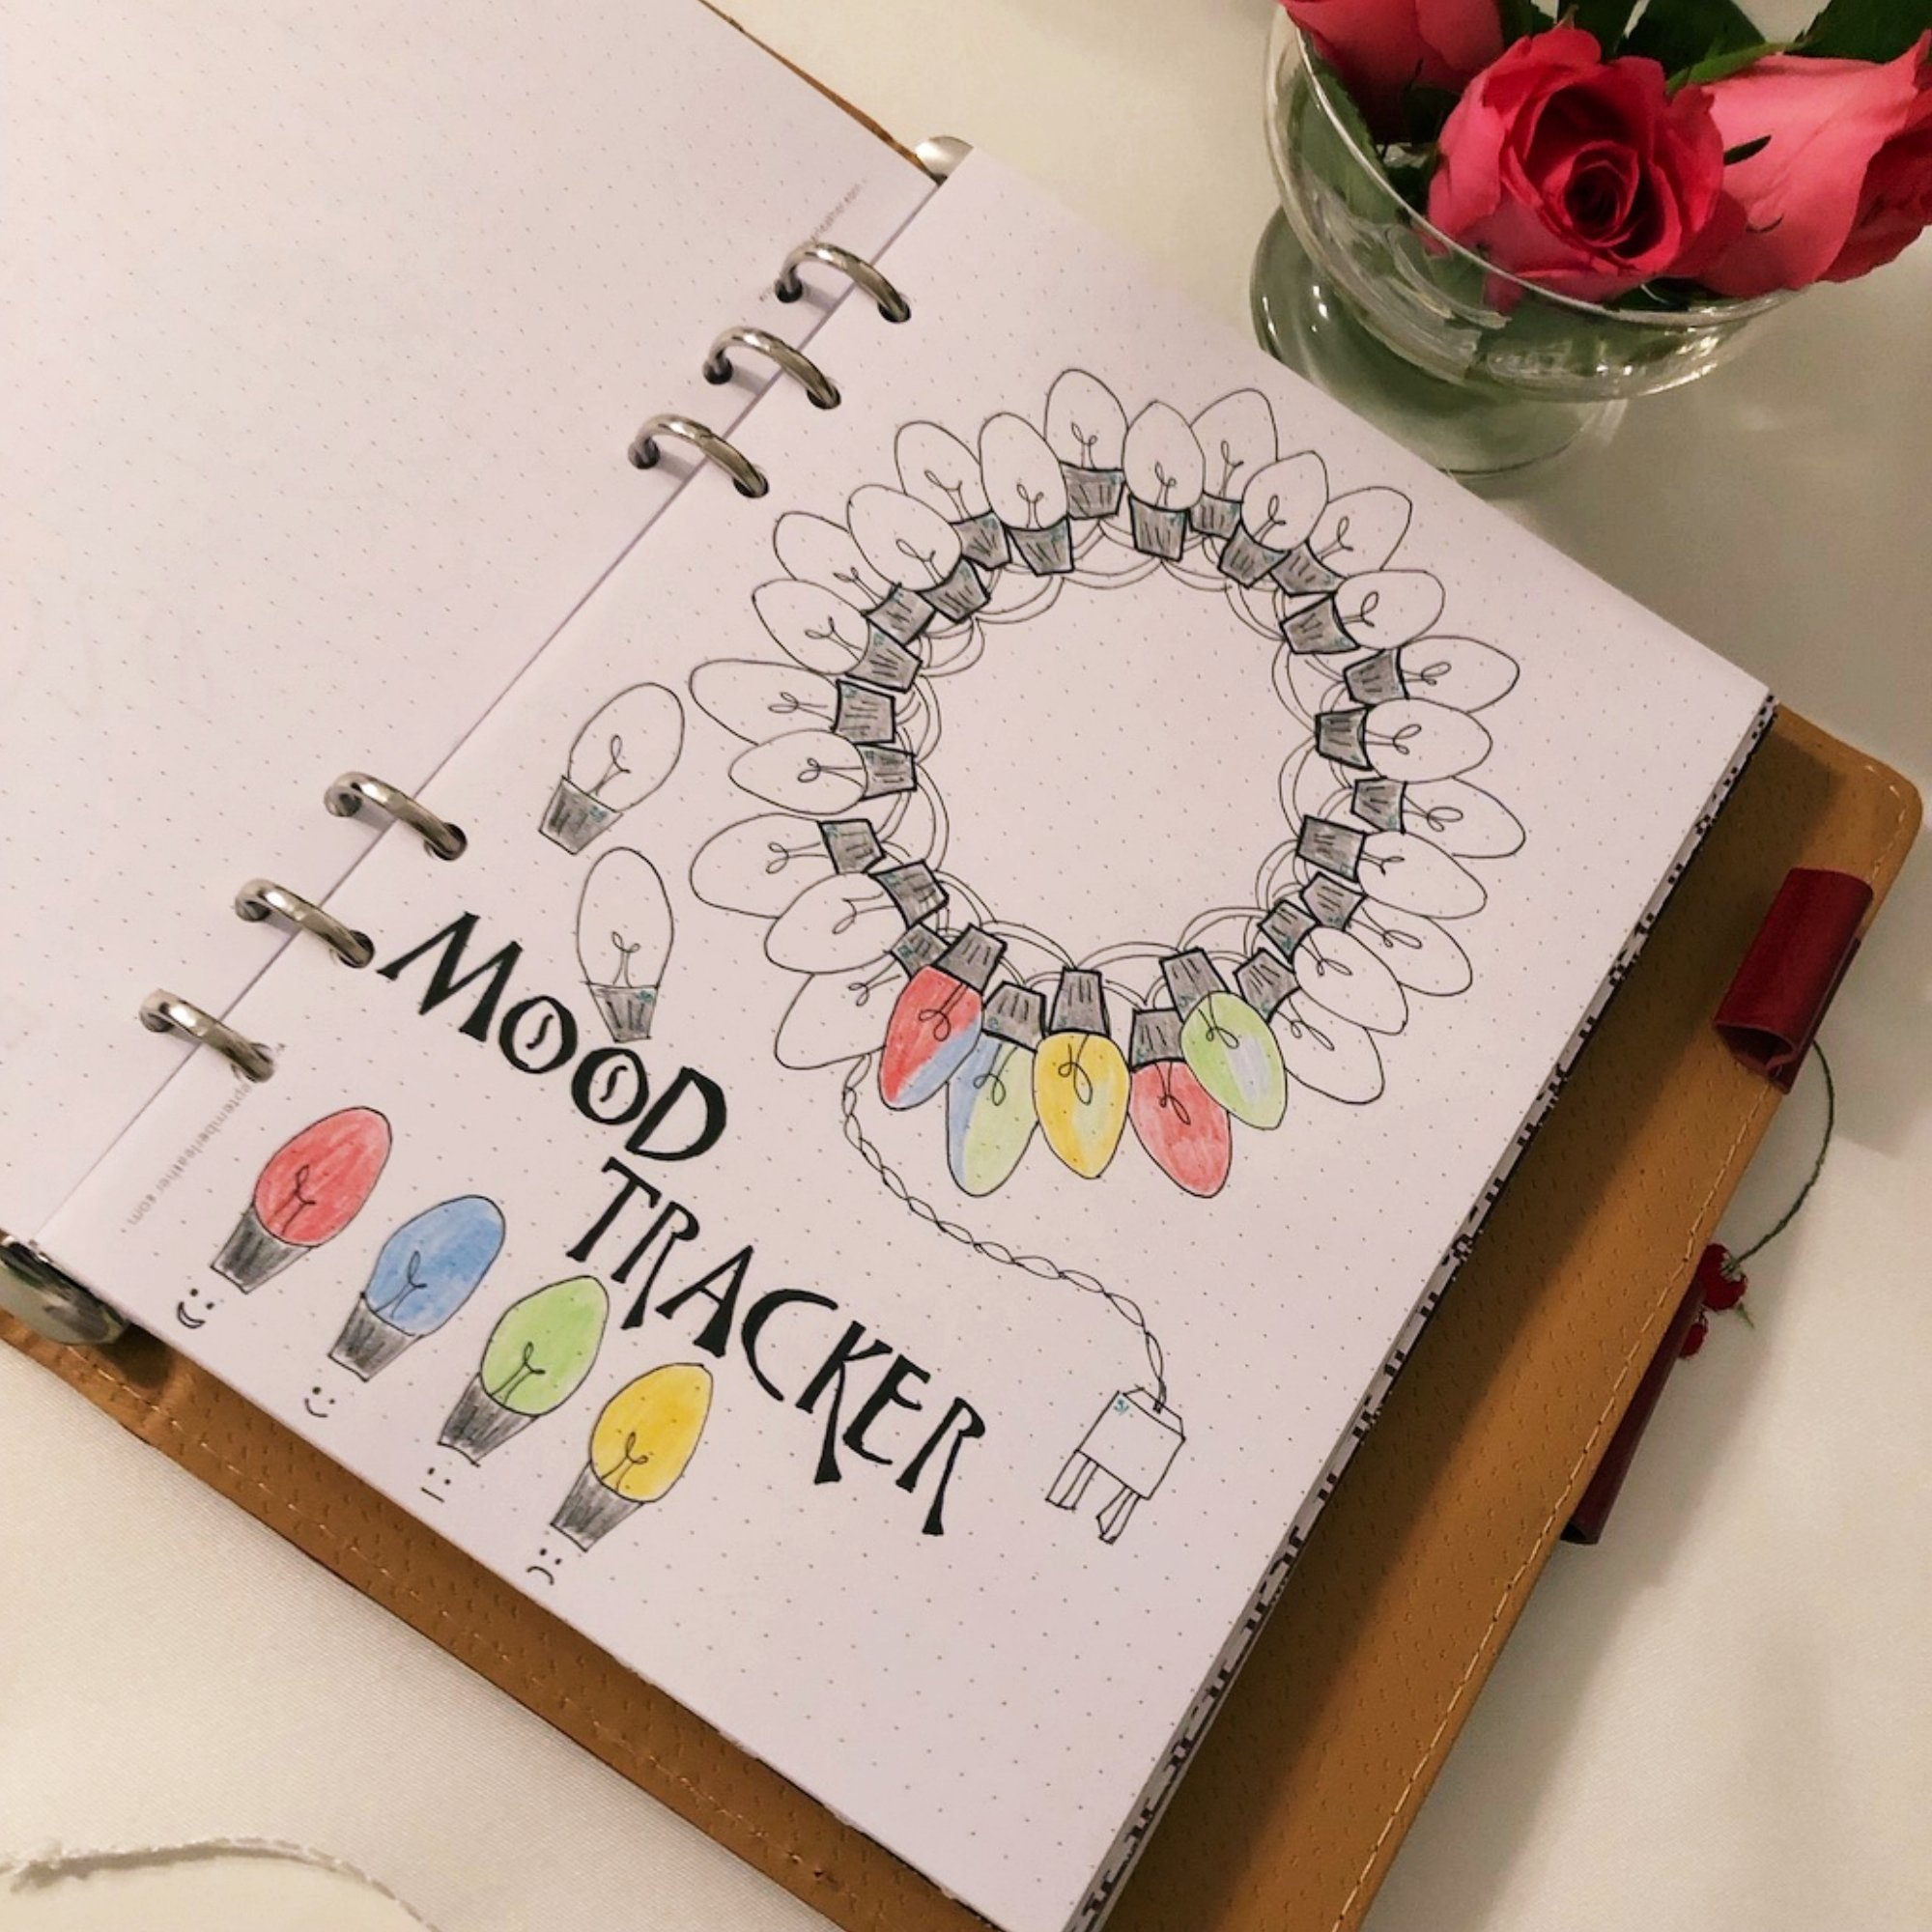 Mood tracker - Christmas tree lights - itstartswithacoffee.com #moodtracker #tracker #journaling #planning #creativejournal #creativejournaling